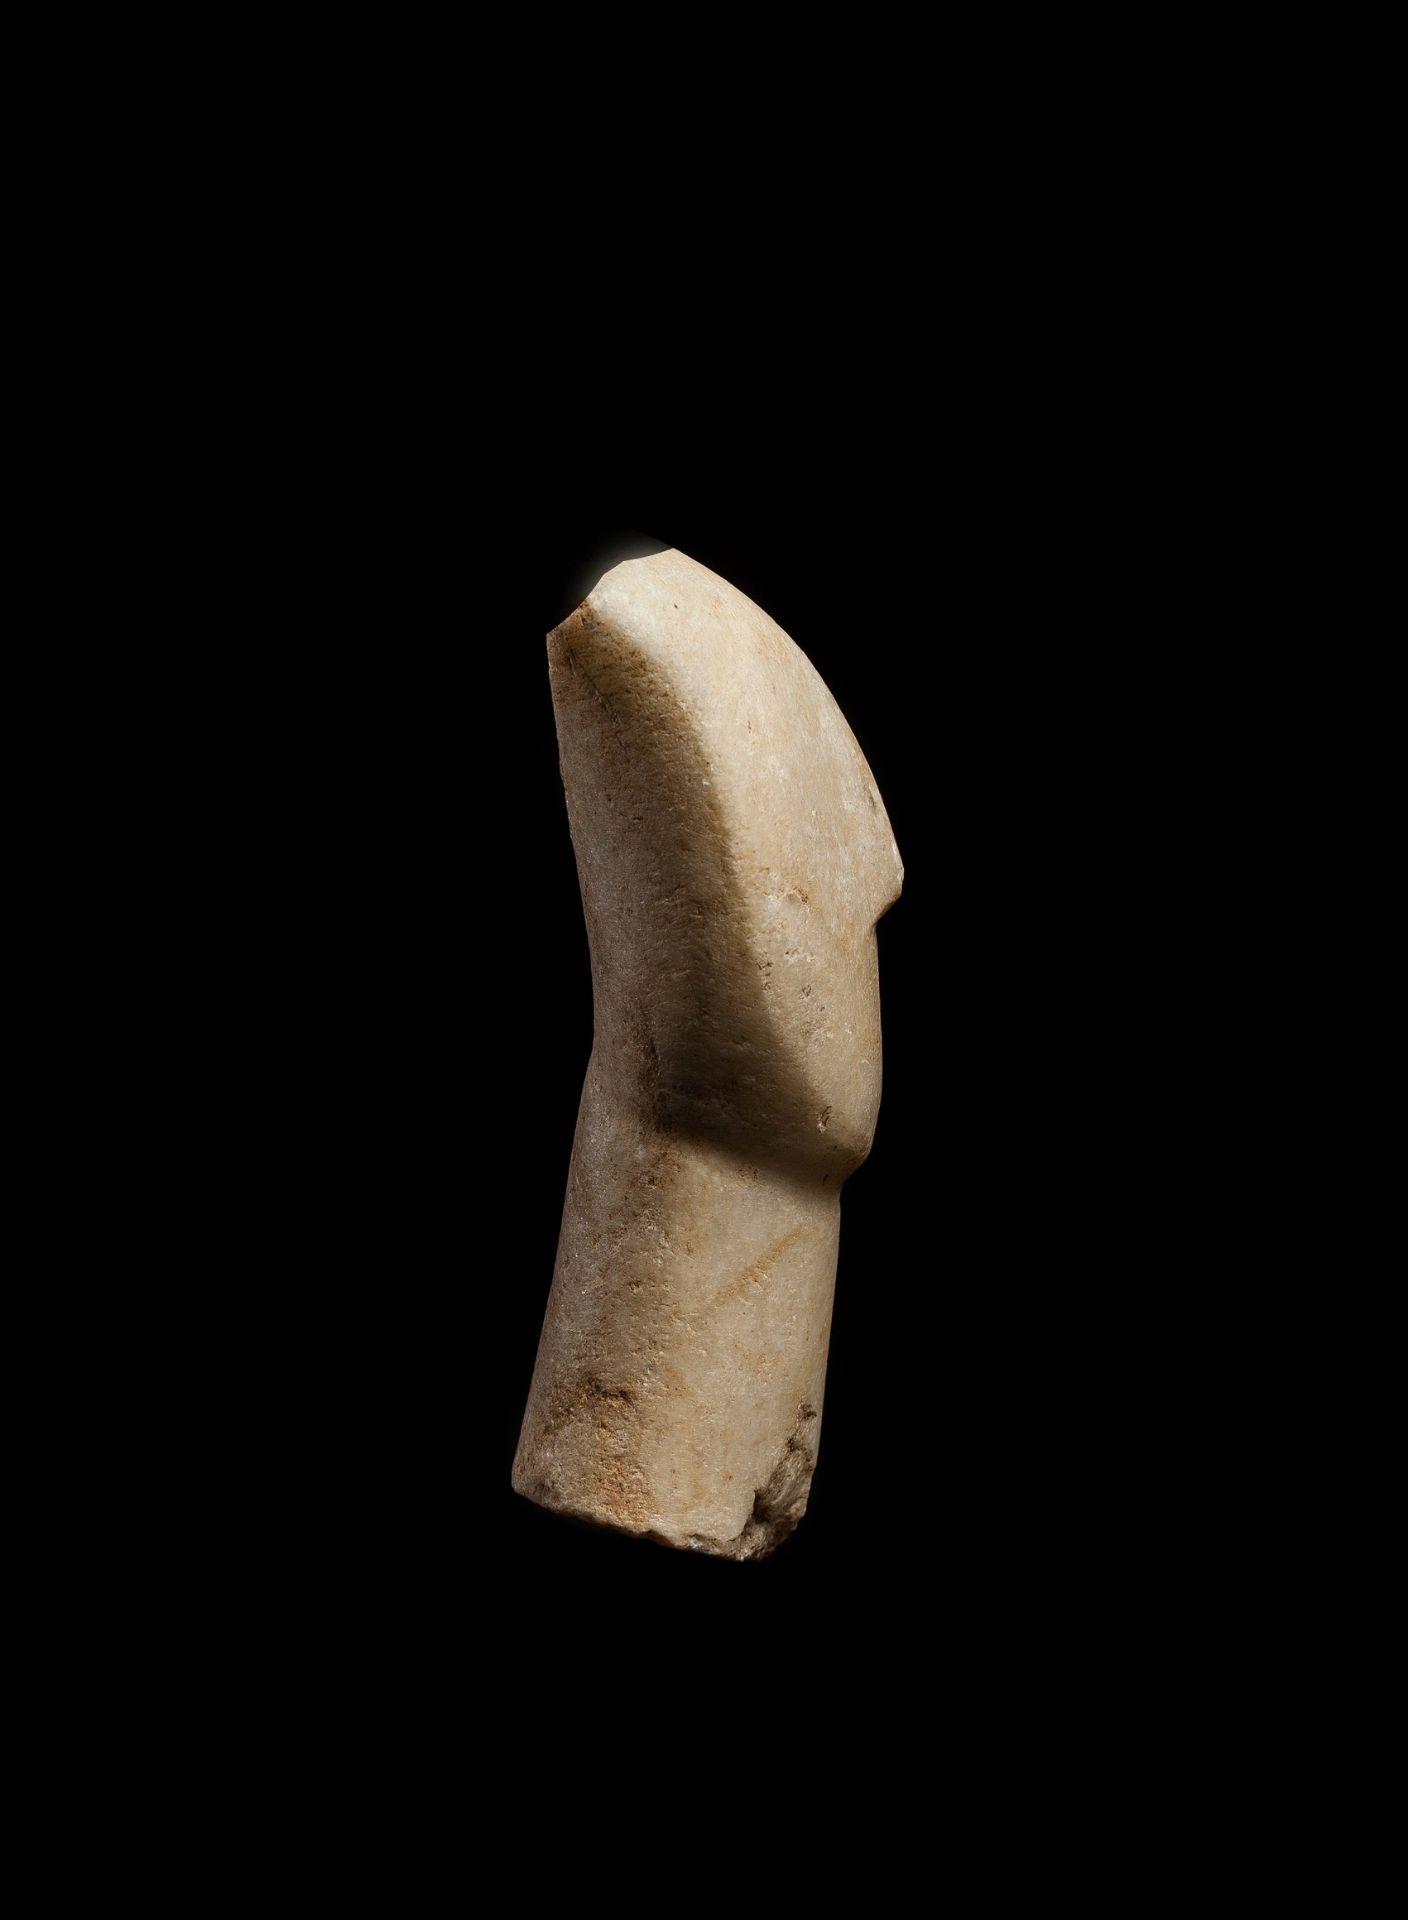 CYCLADIC IDOL HEAD CYCLADES, EARLY CYCLADIC II, C. 2600 - 2400 B.C. - Image 3 of 6